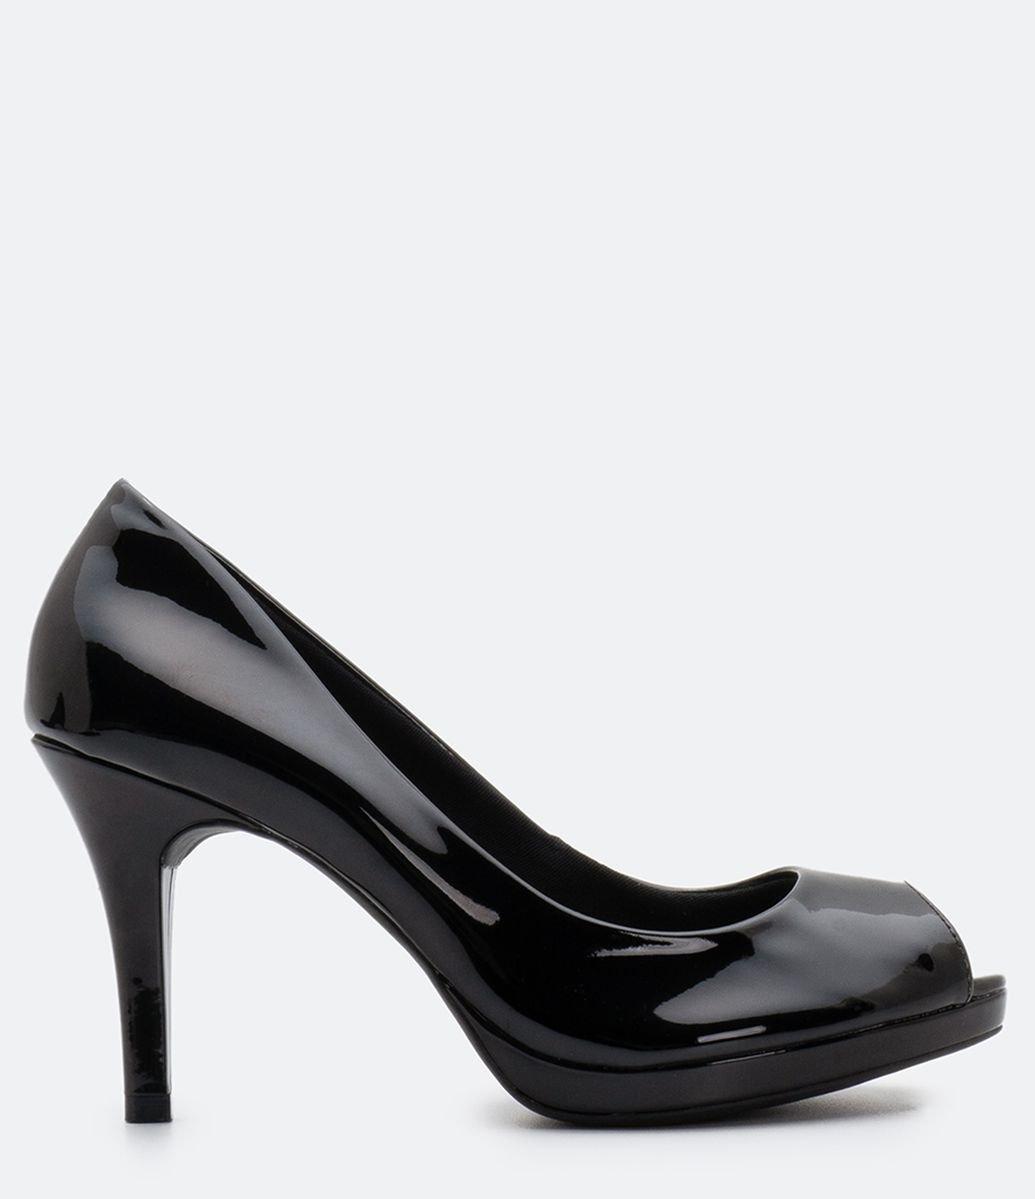 b874dd349a Menor preço em Sapato Feminino Peep Toe Via Marte